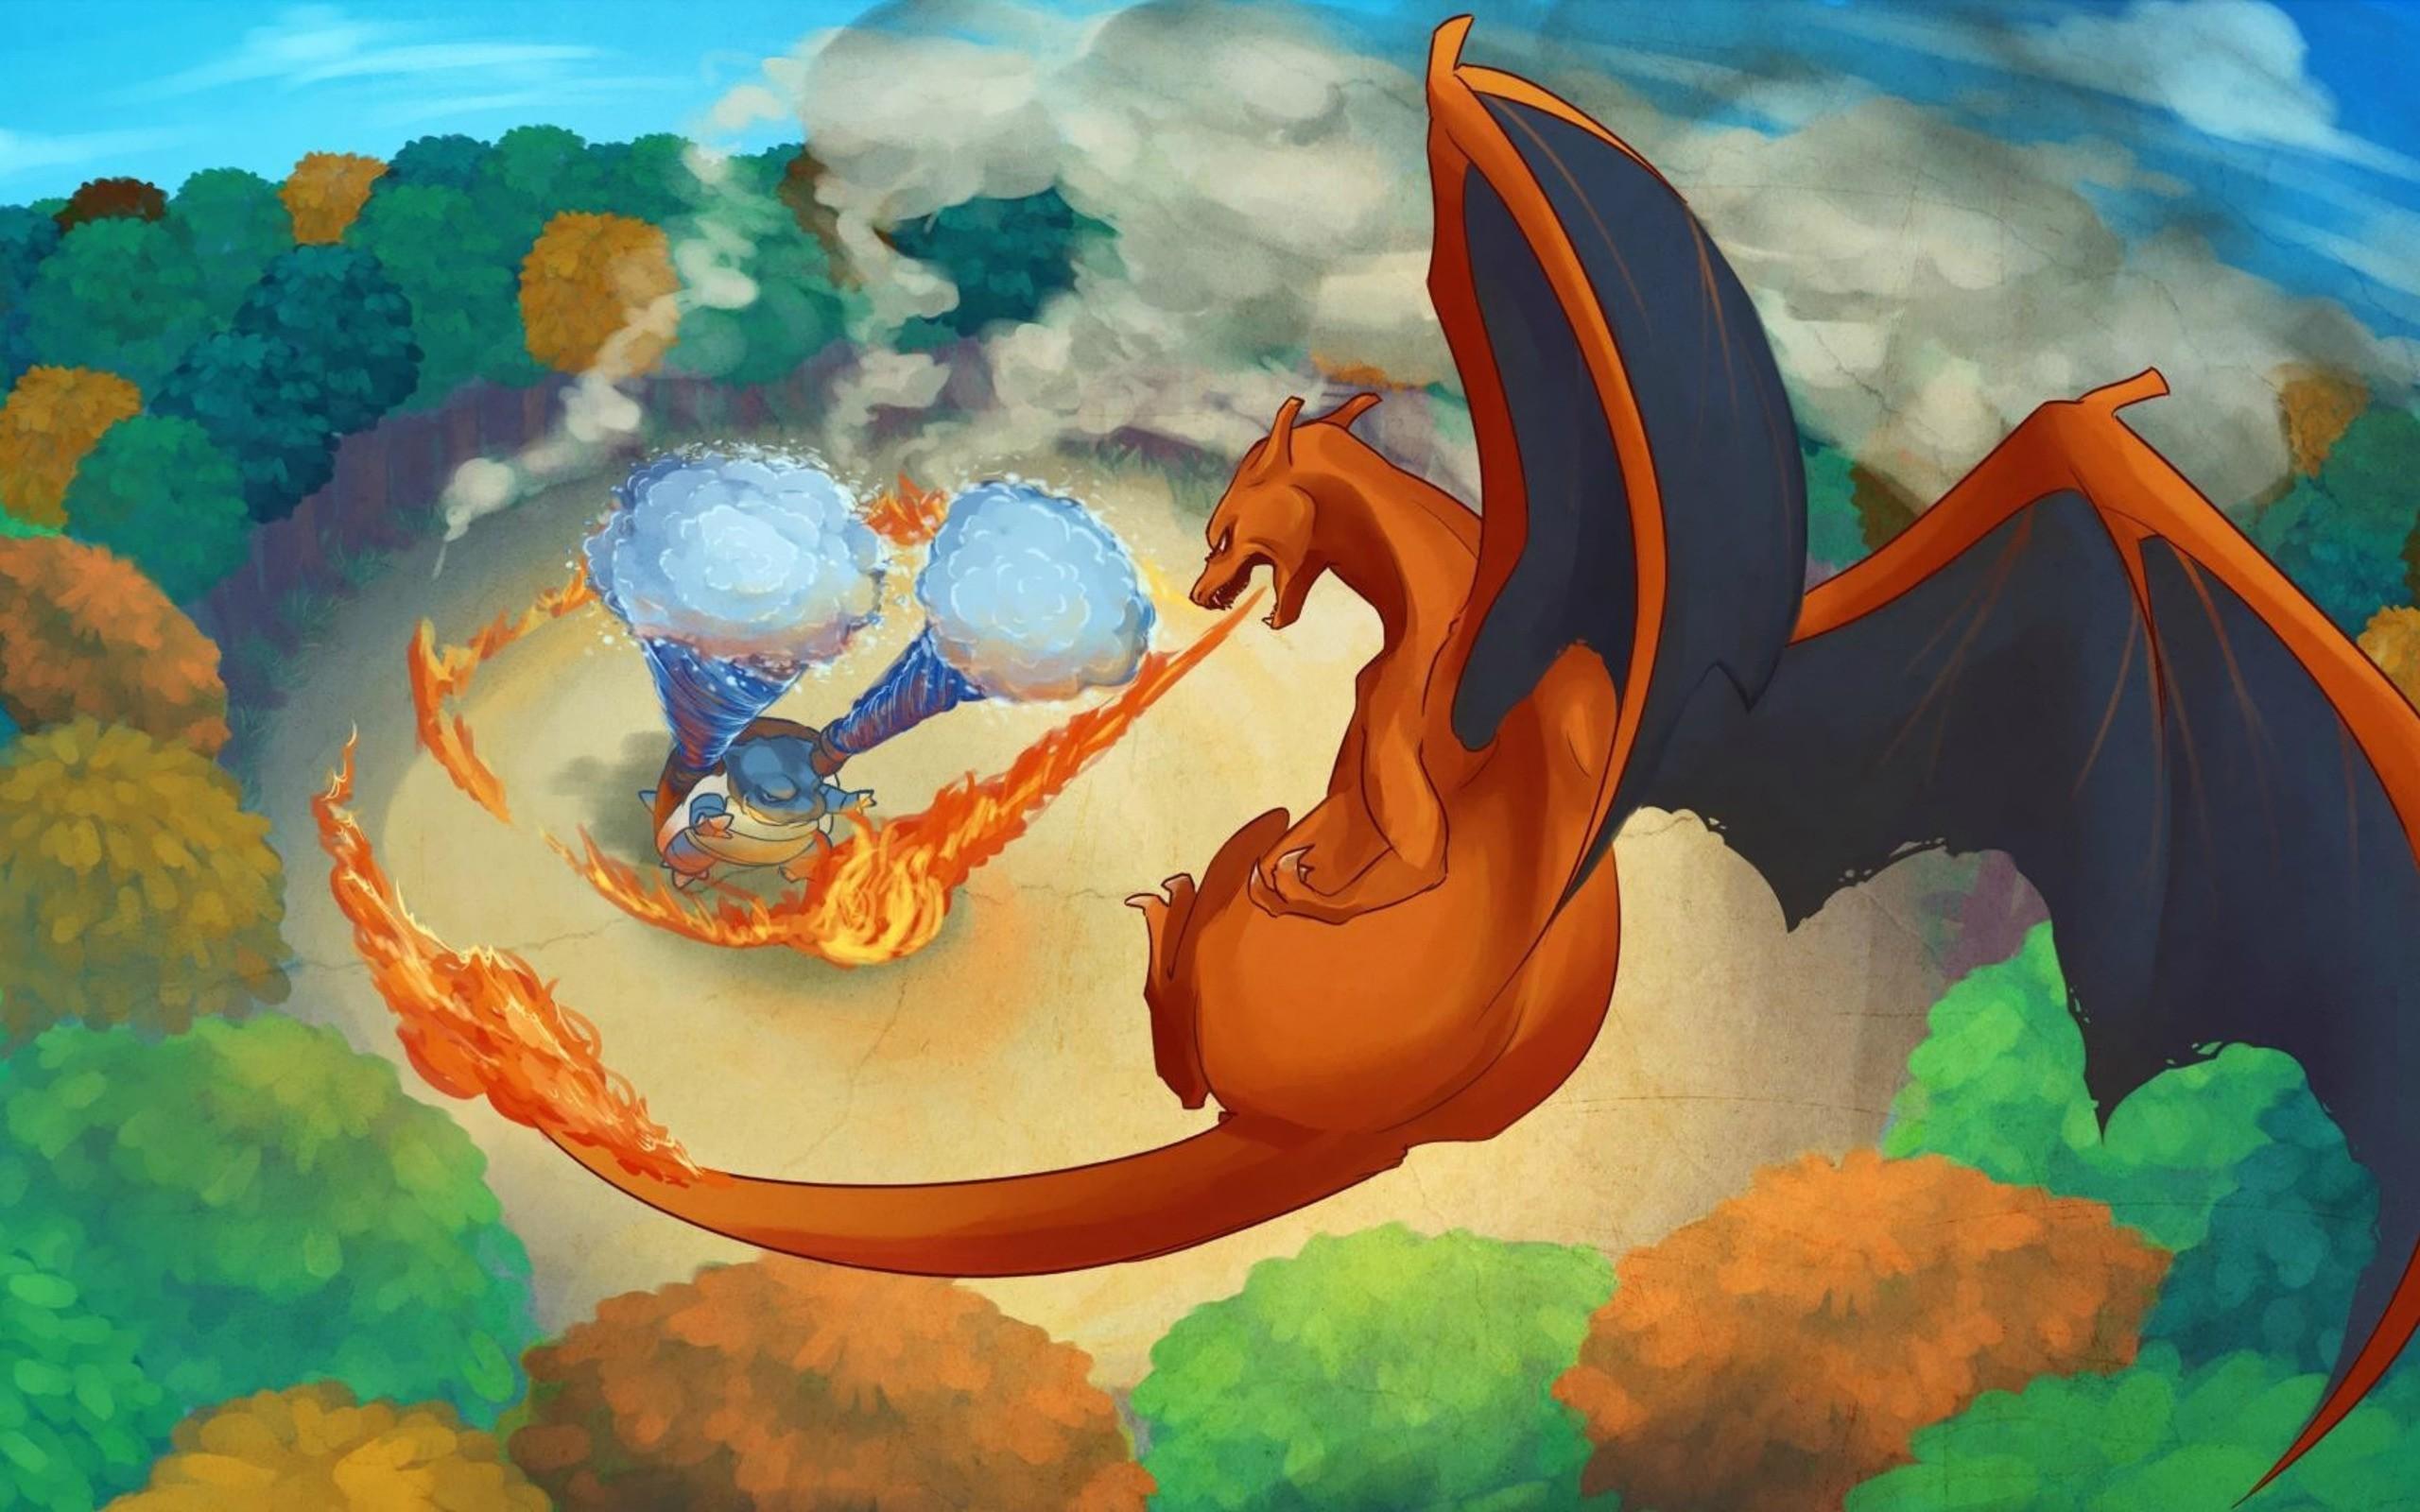 HD Pokemon Charizard Backgrounds.